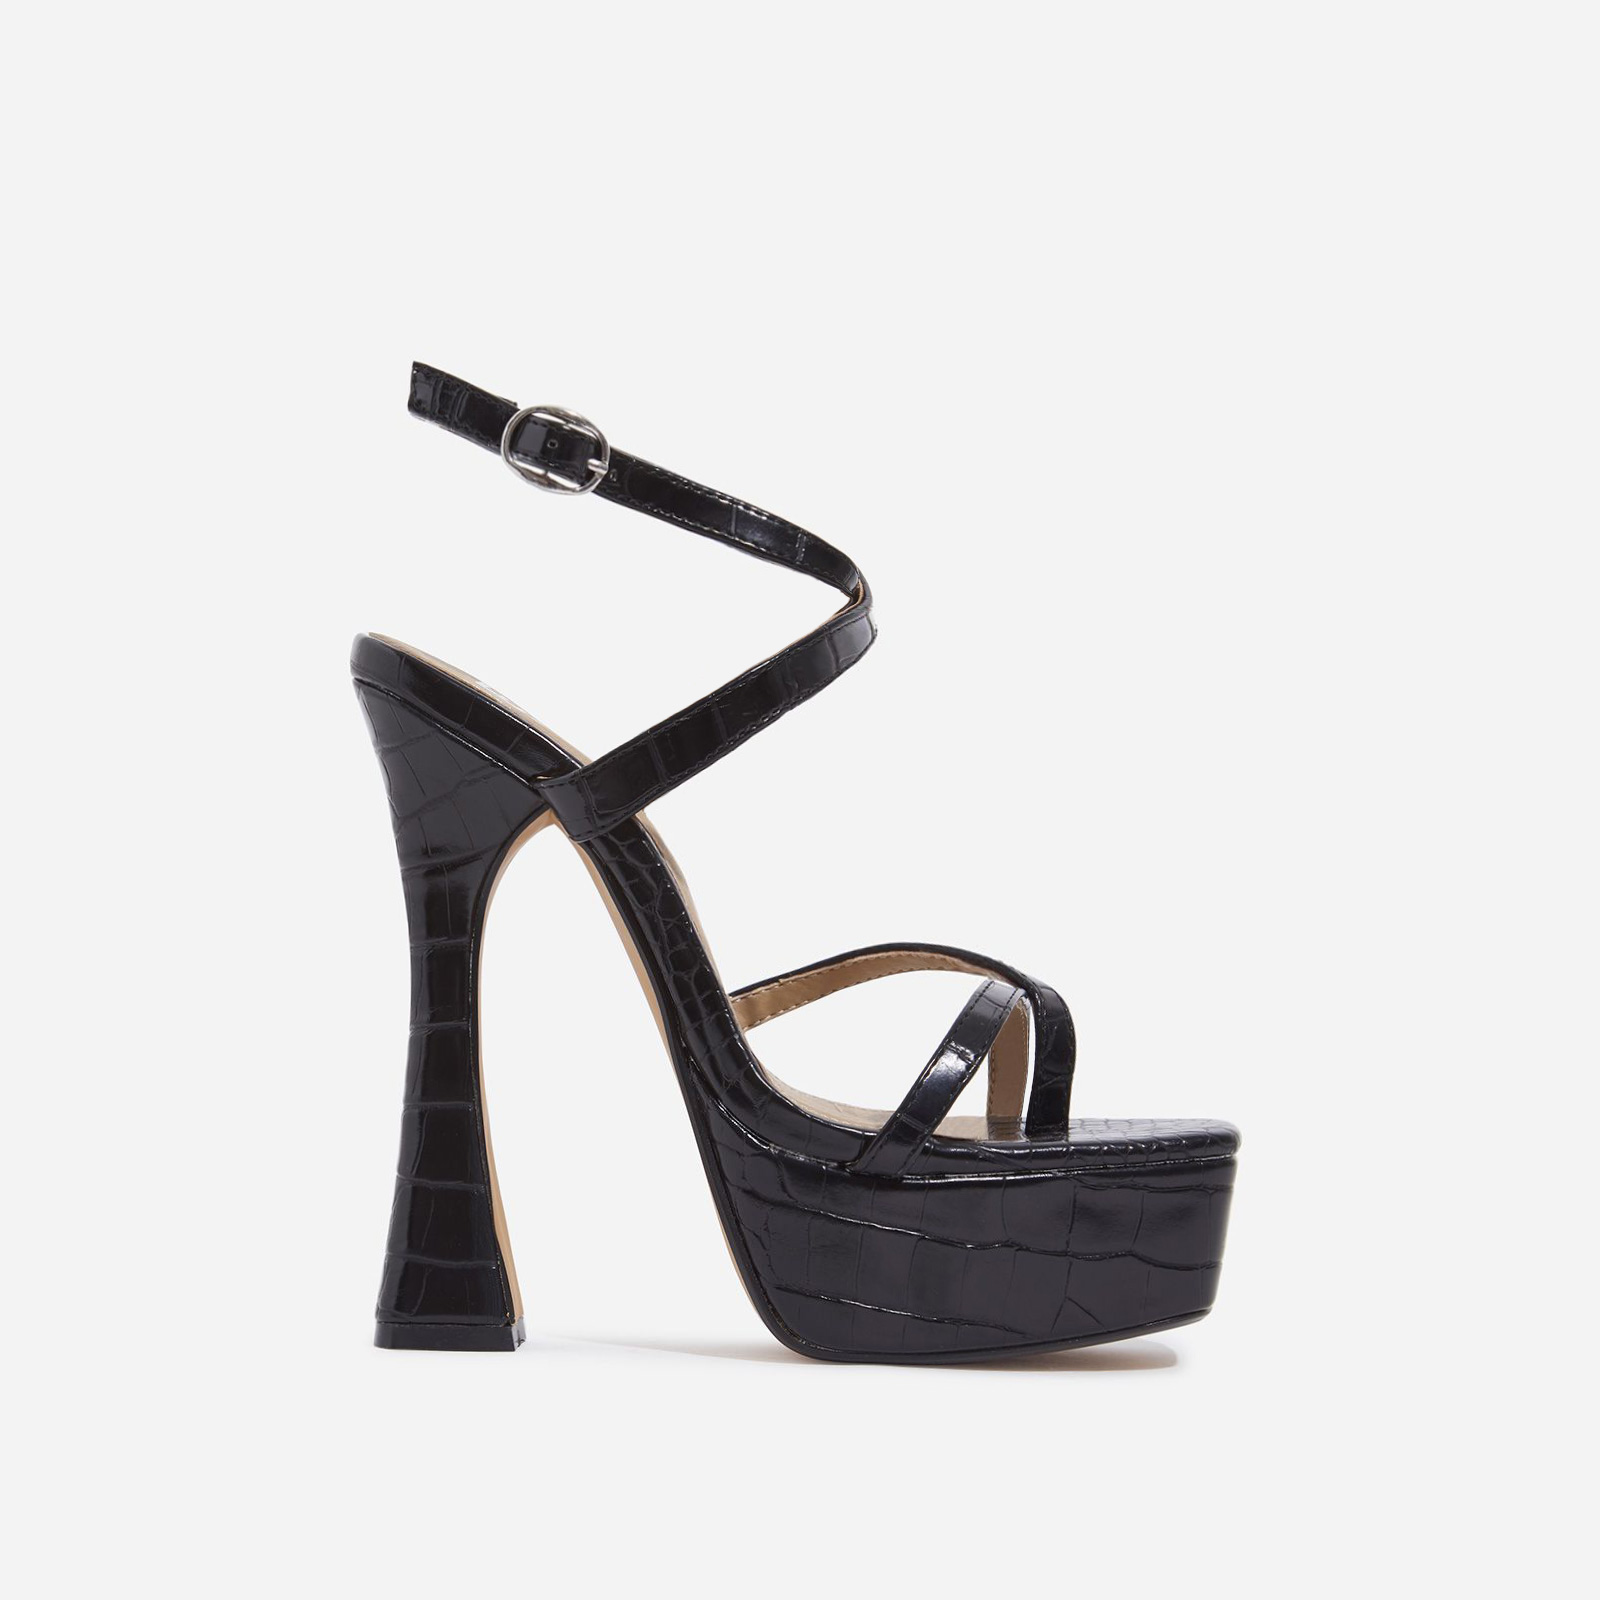 Vox Square Toe Platform Flared Heel In Black Croc Print Faux Leather